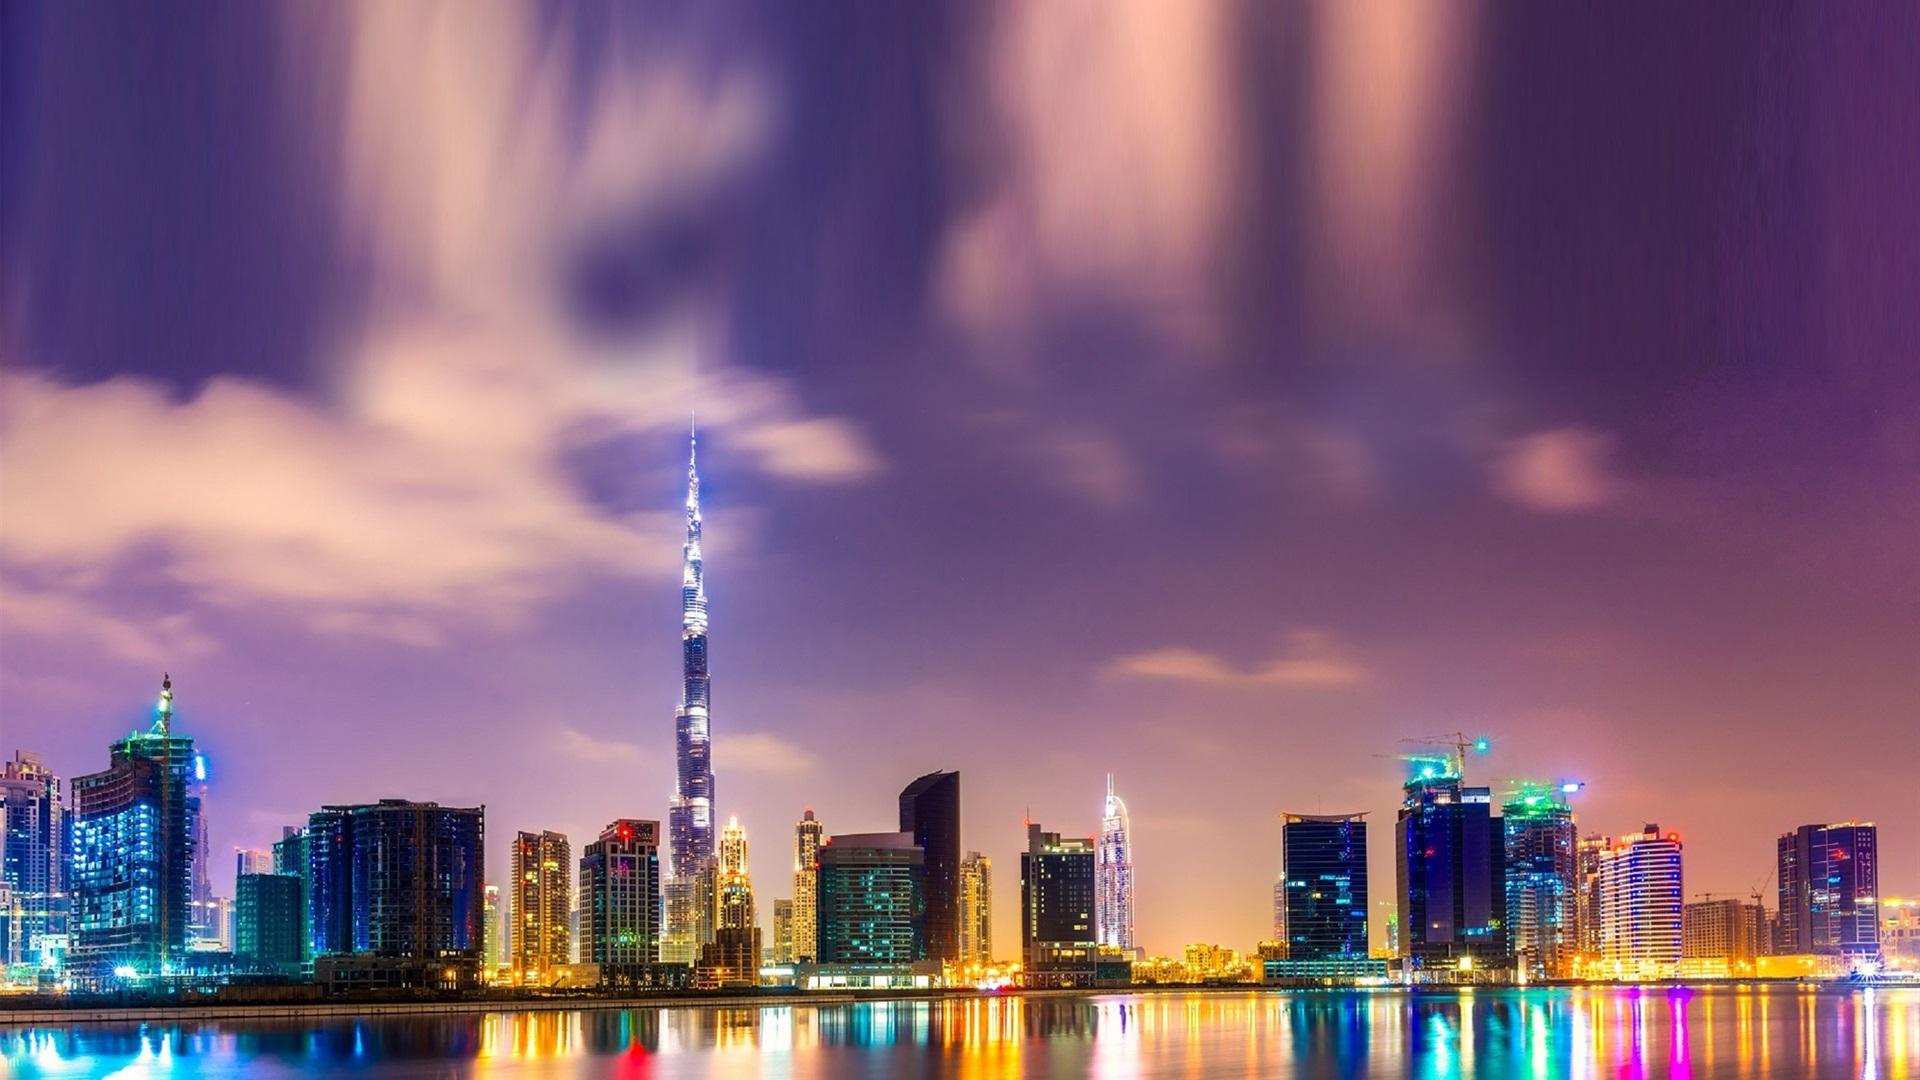 Wallpaper beautiful night in dubai burj khalifa high - Dubai burj khalifa hd wallpaper ...